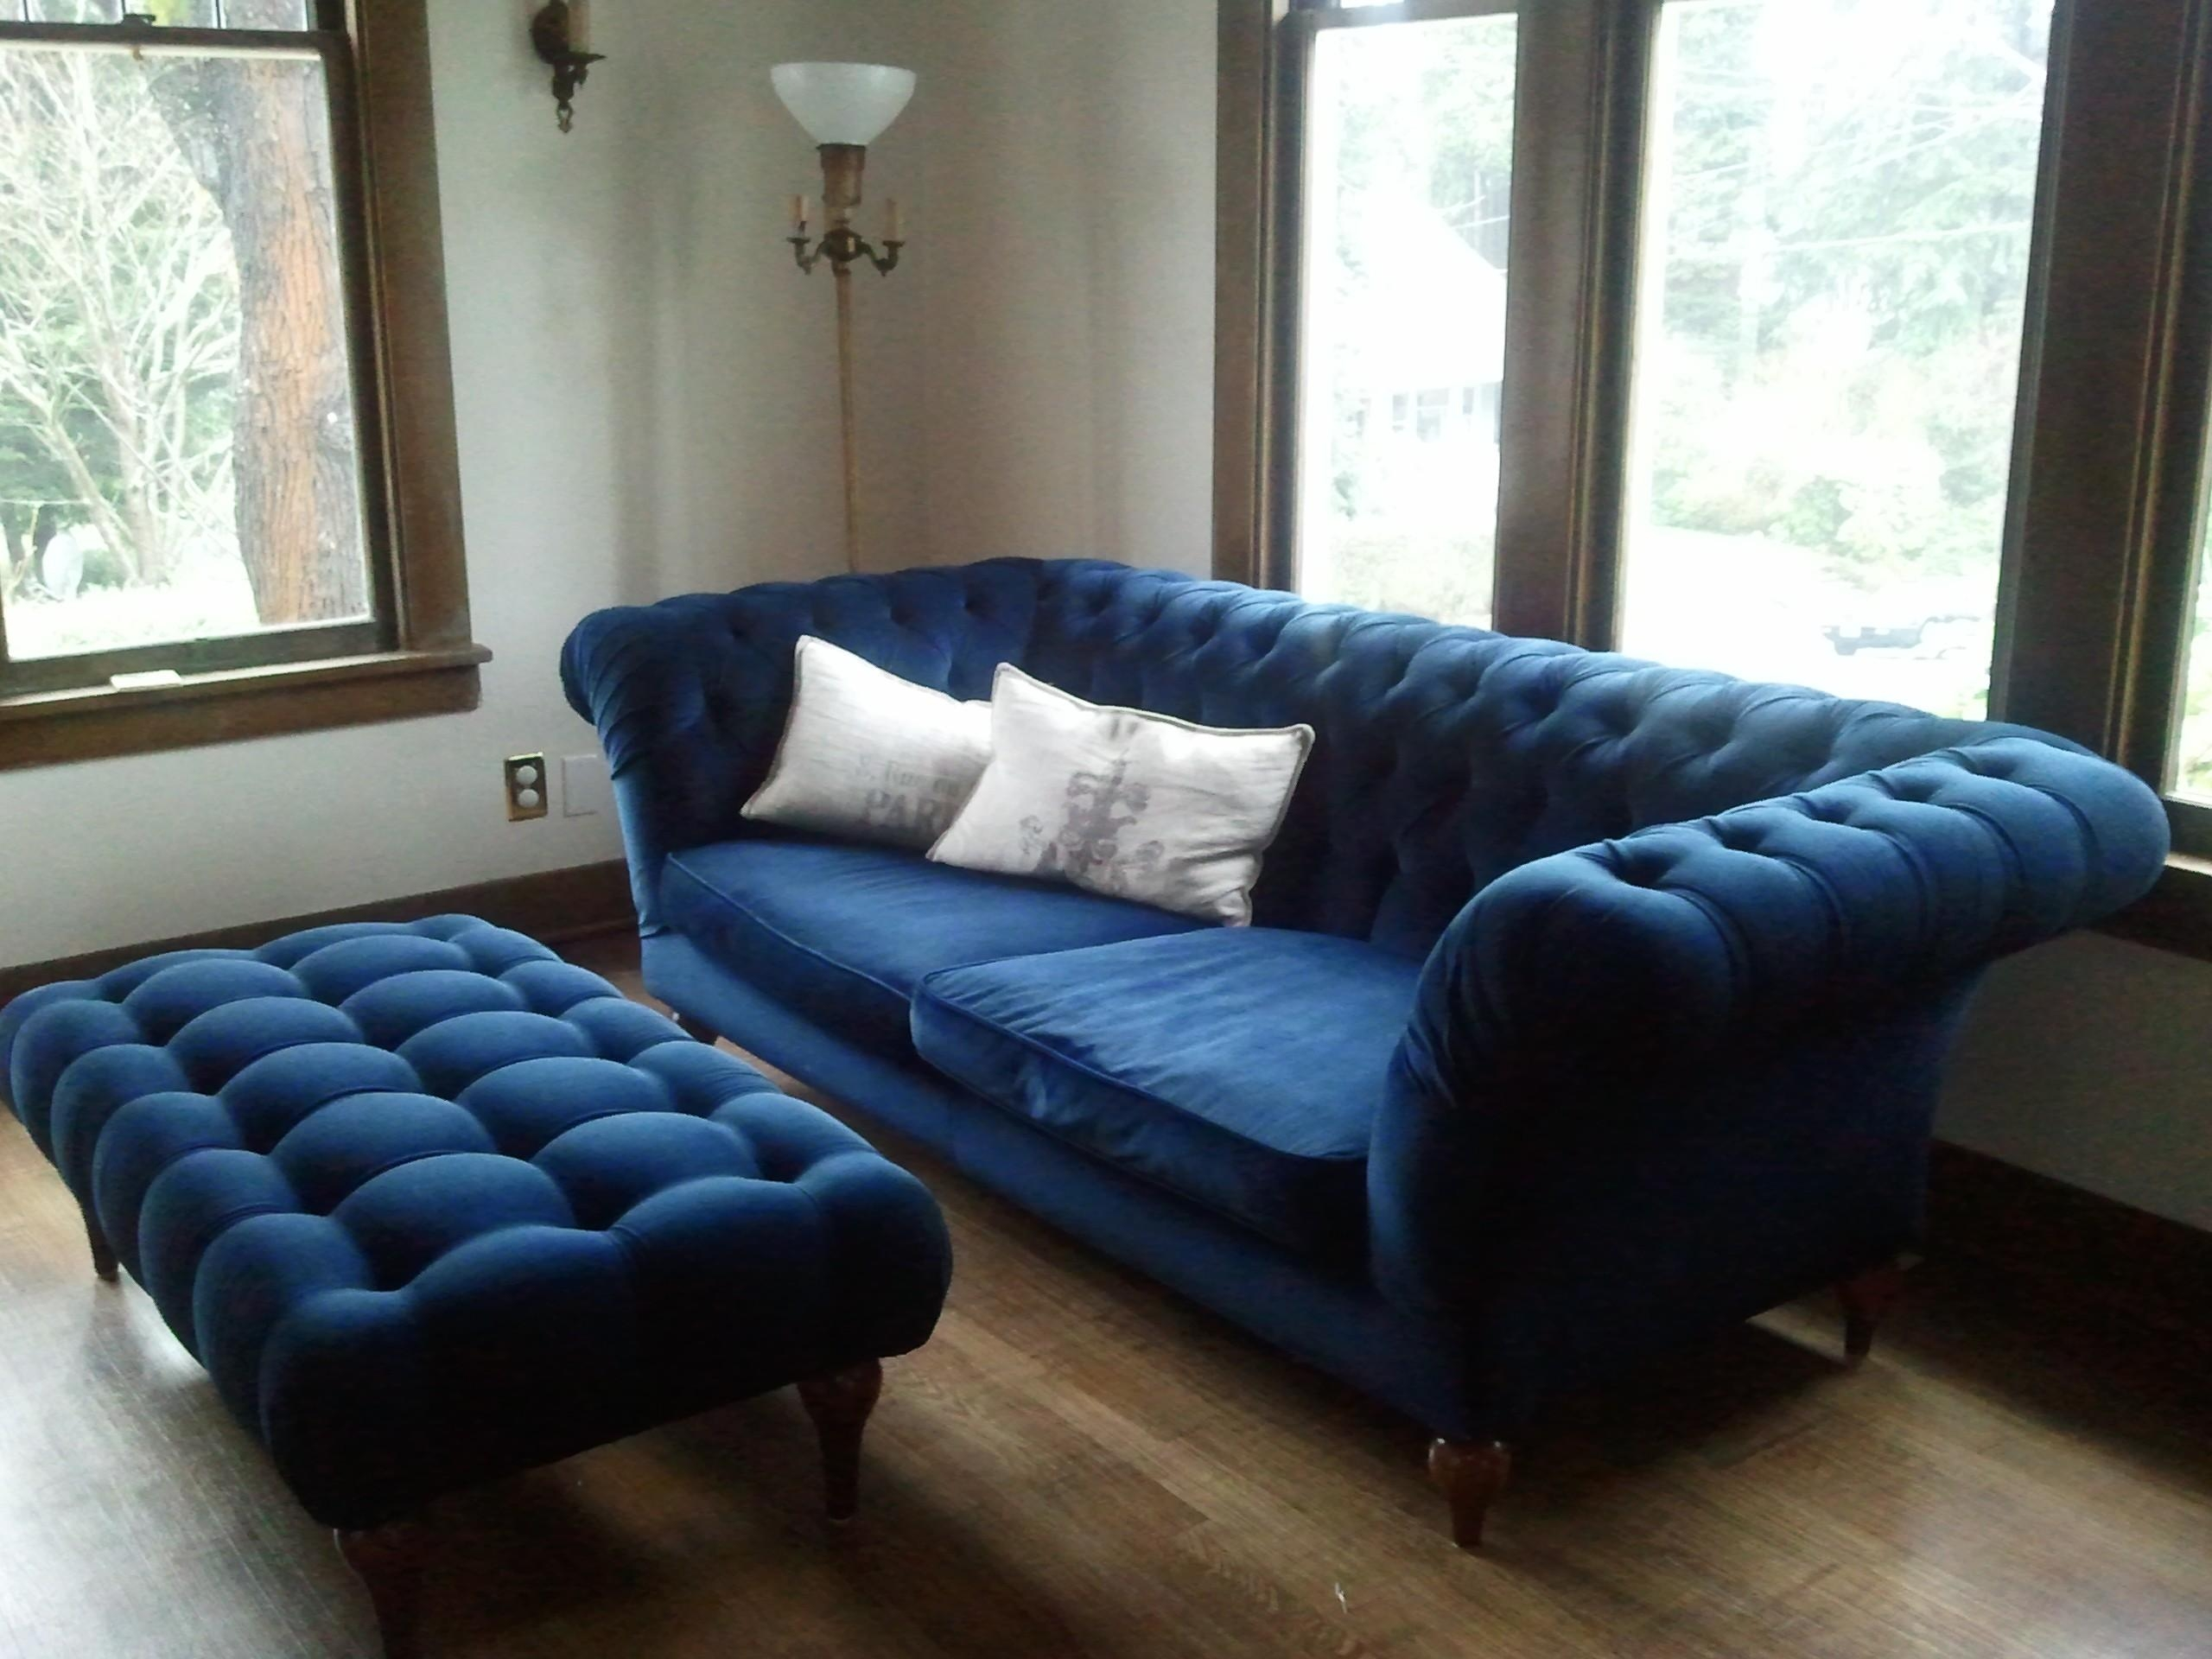 Sofas Center : Denim Blue Sofa Sectionals Jean Set Microfiber Inside Blue Jean Sofas (Image 14 of 20)